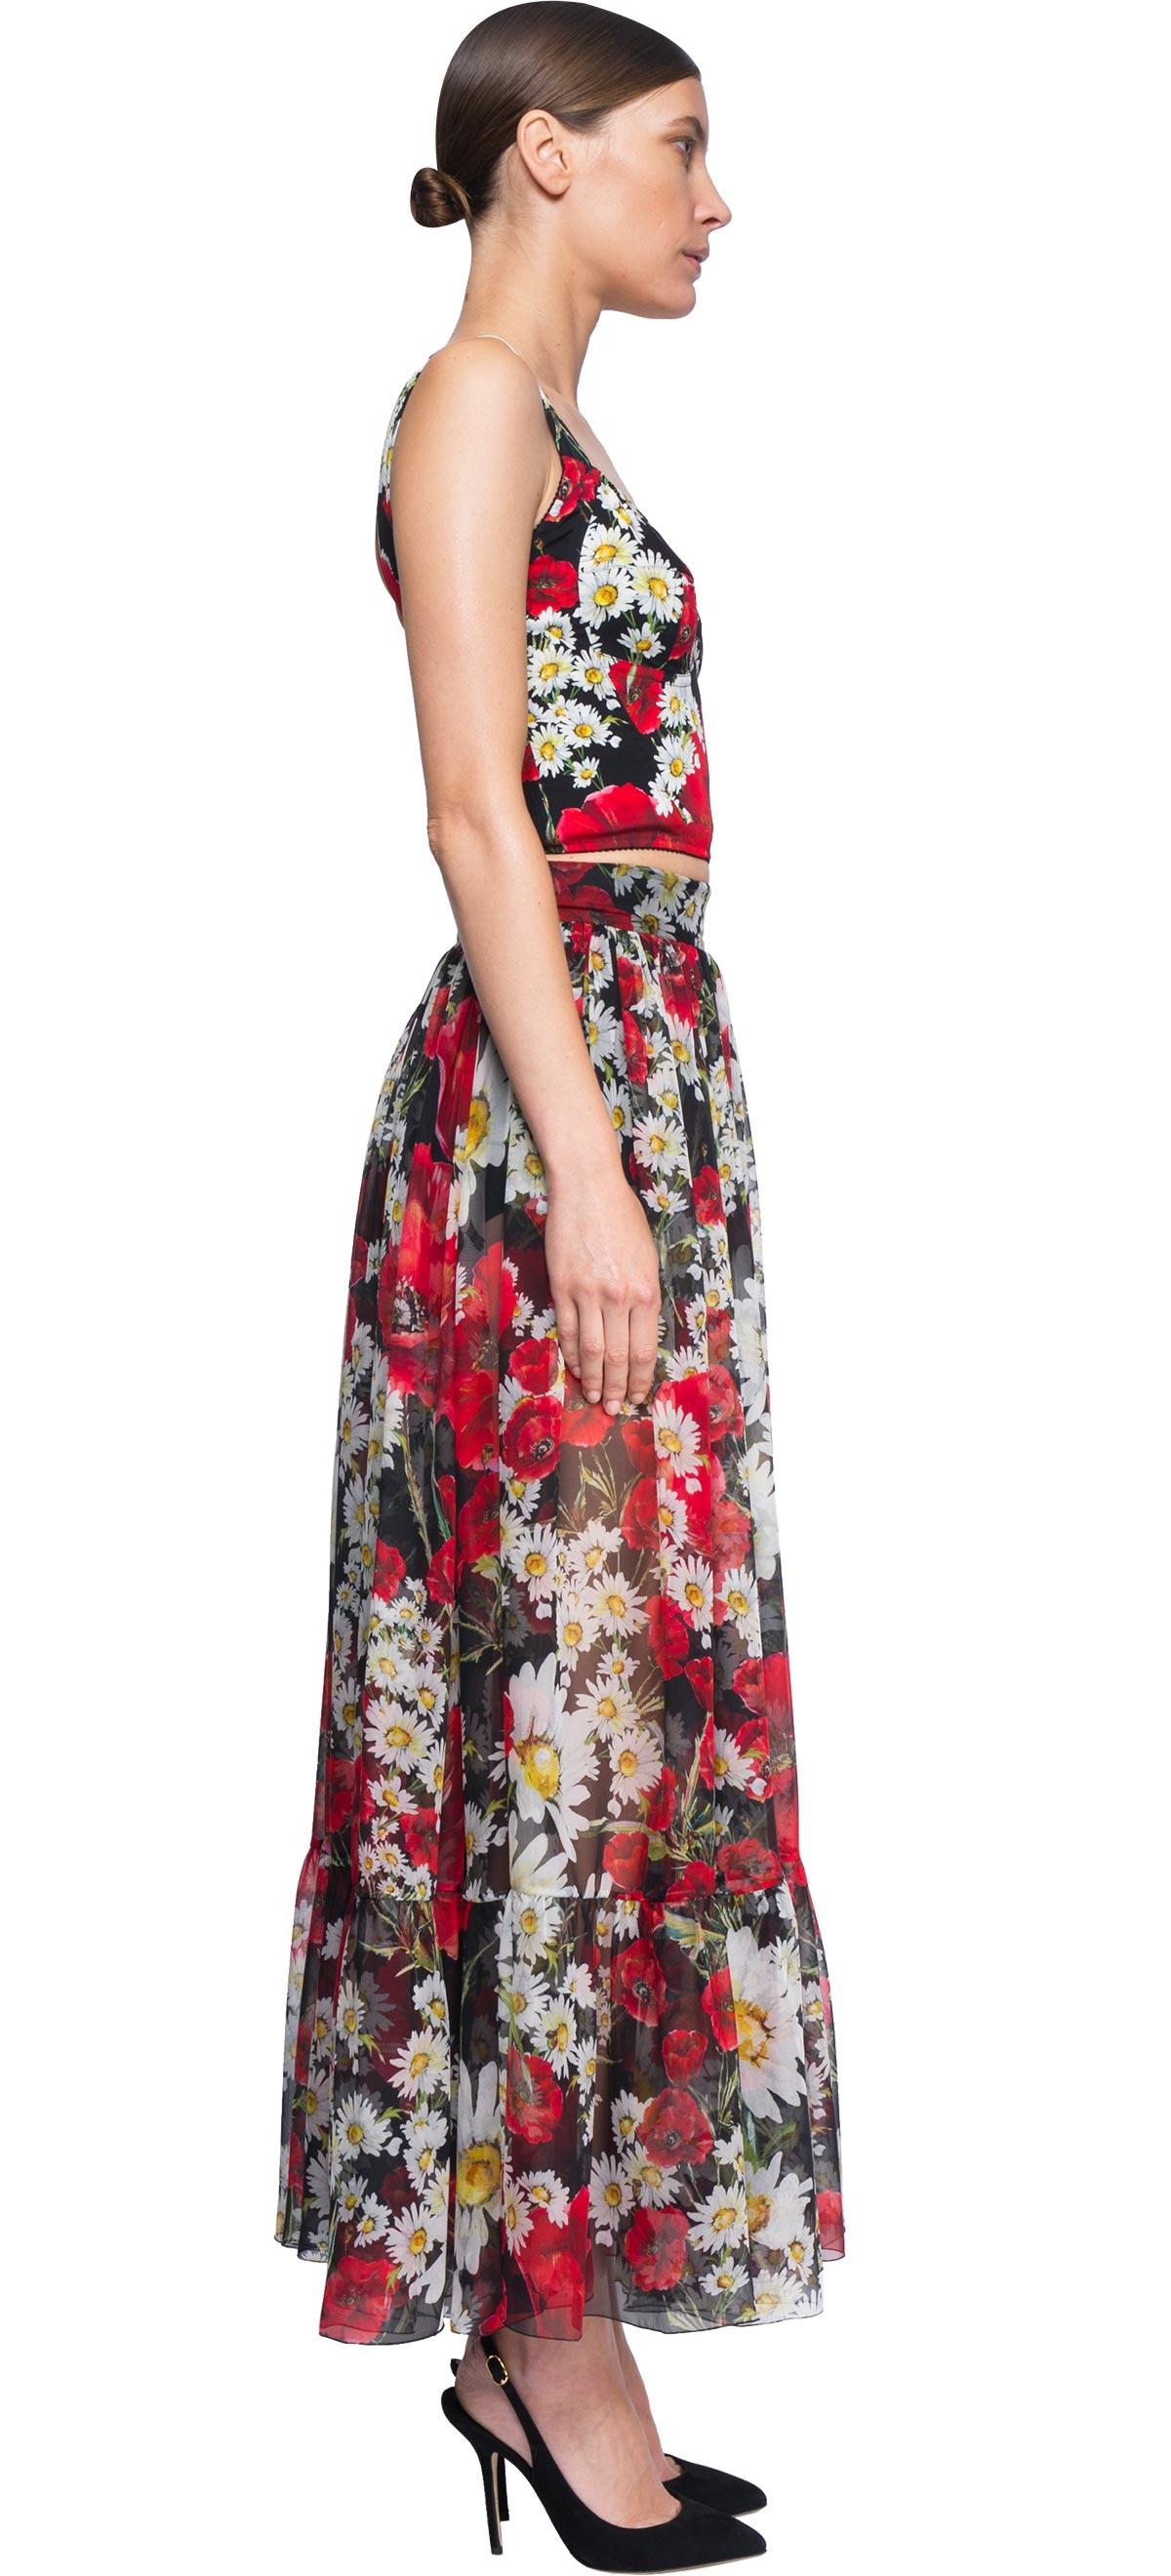 9252fc382f Lyst - Dolce   Gabbana Floral Crop Top